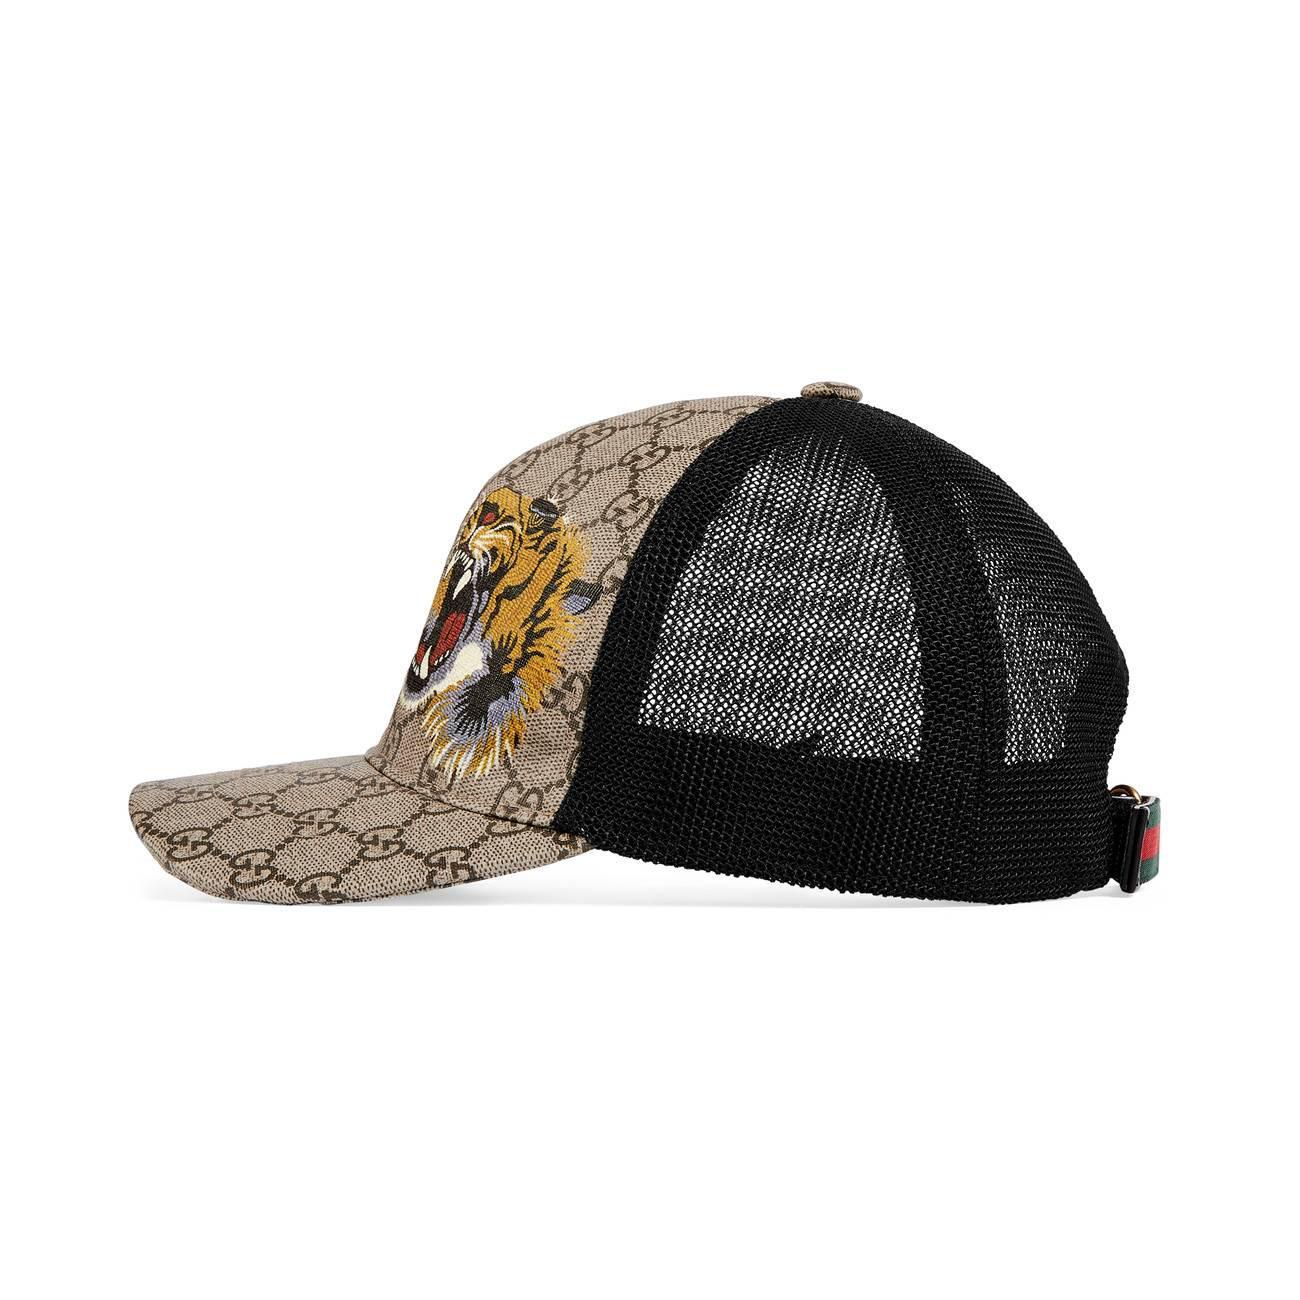 Gucci - Multicolor Tigers Print GG Supreme Baseball Hat for Men - Lyst.  View fullscreen a683f493ecd3